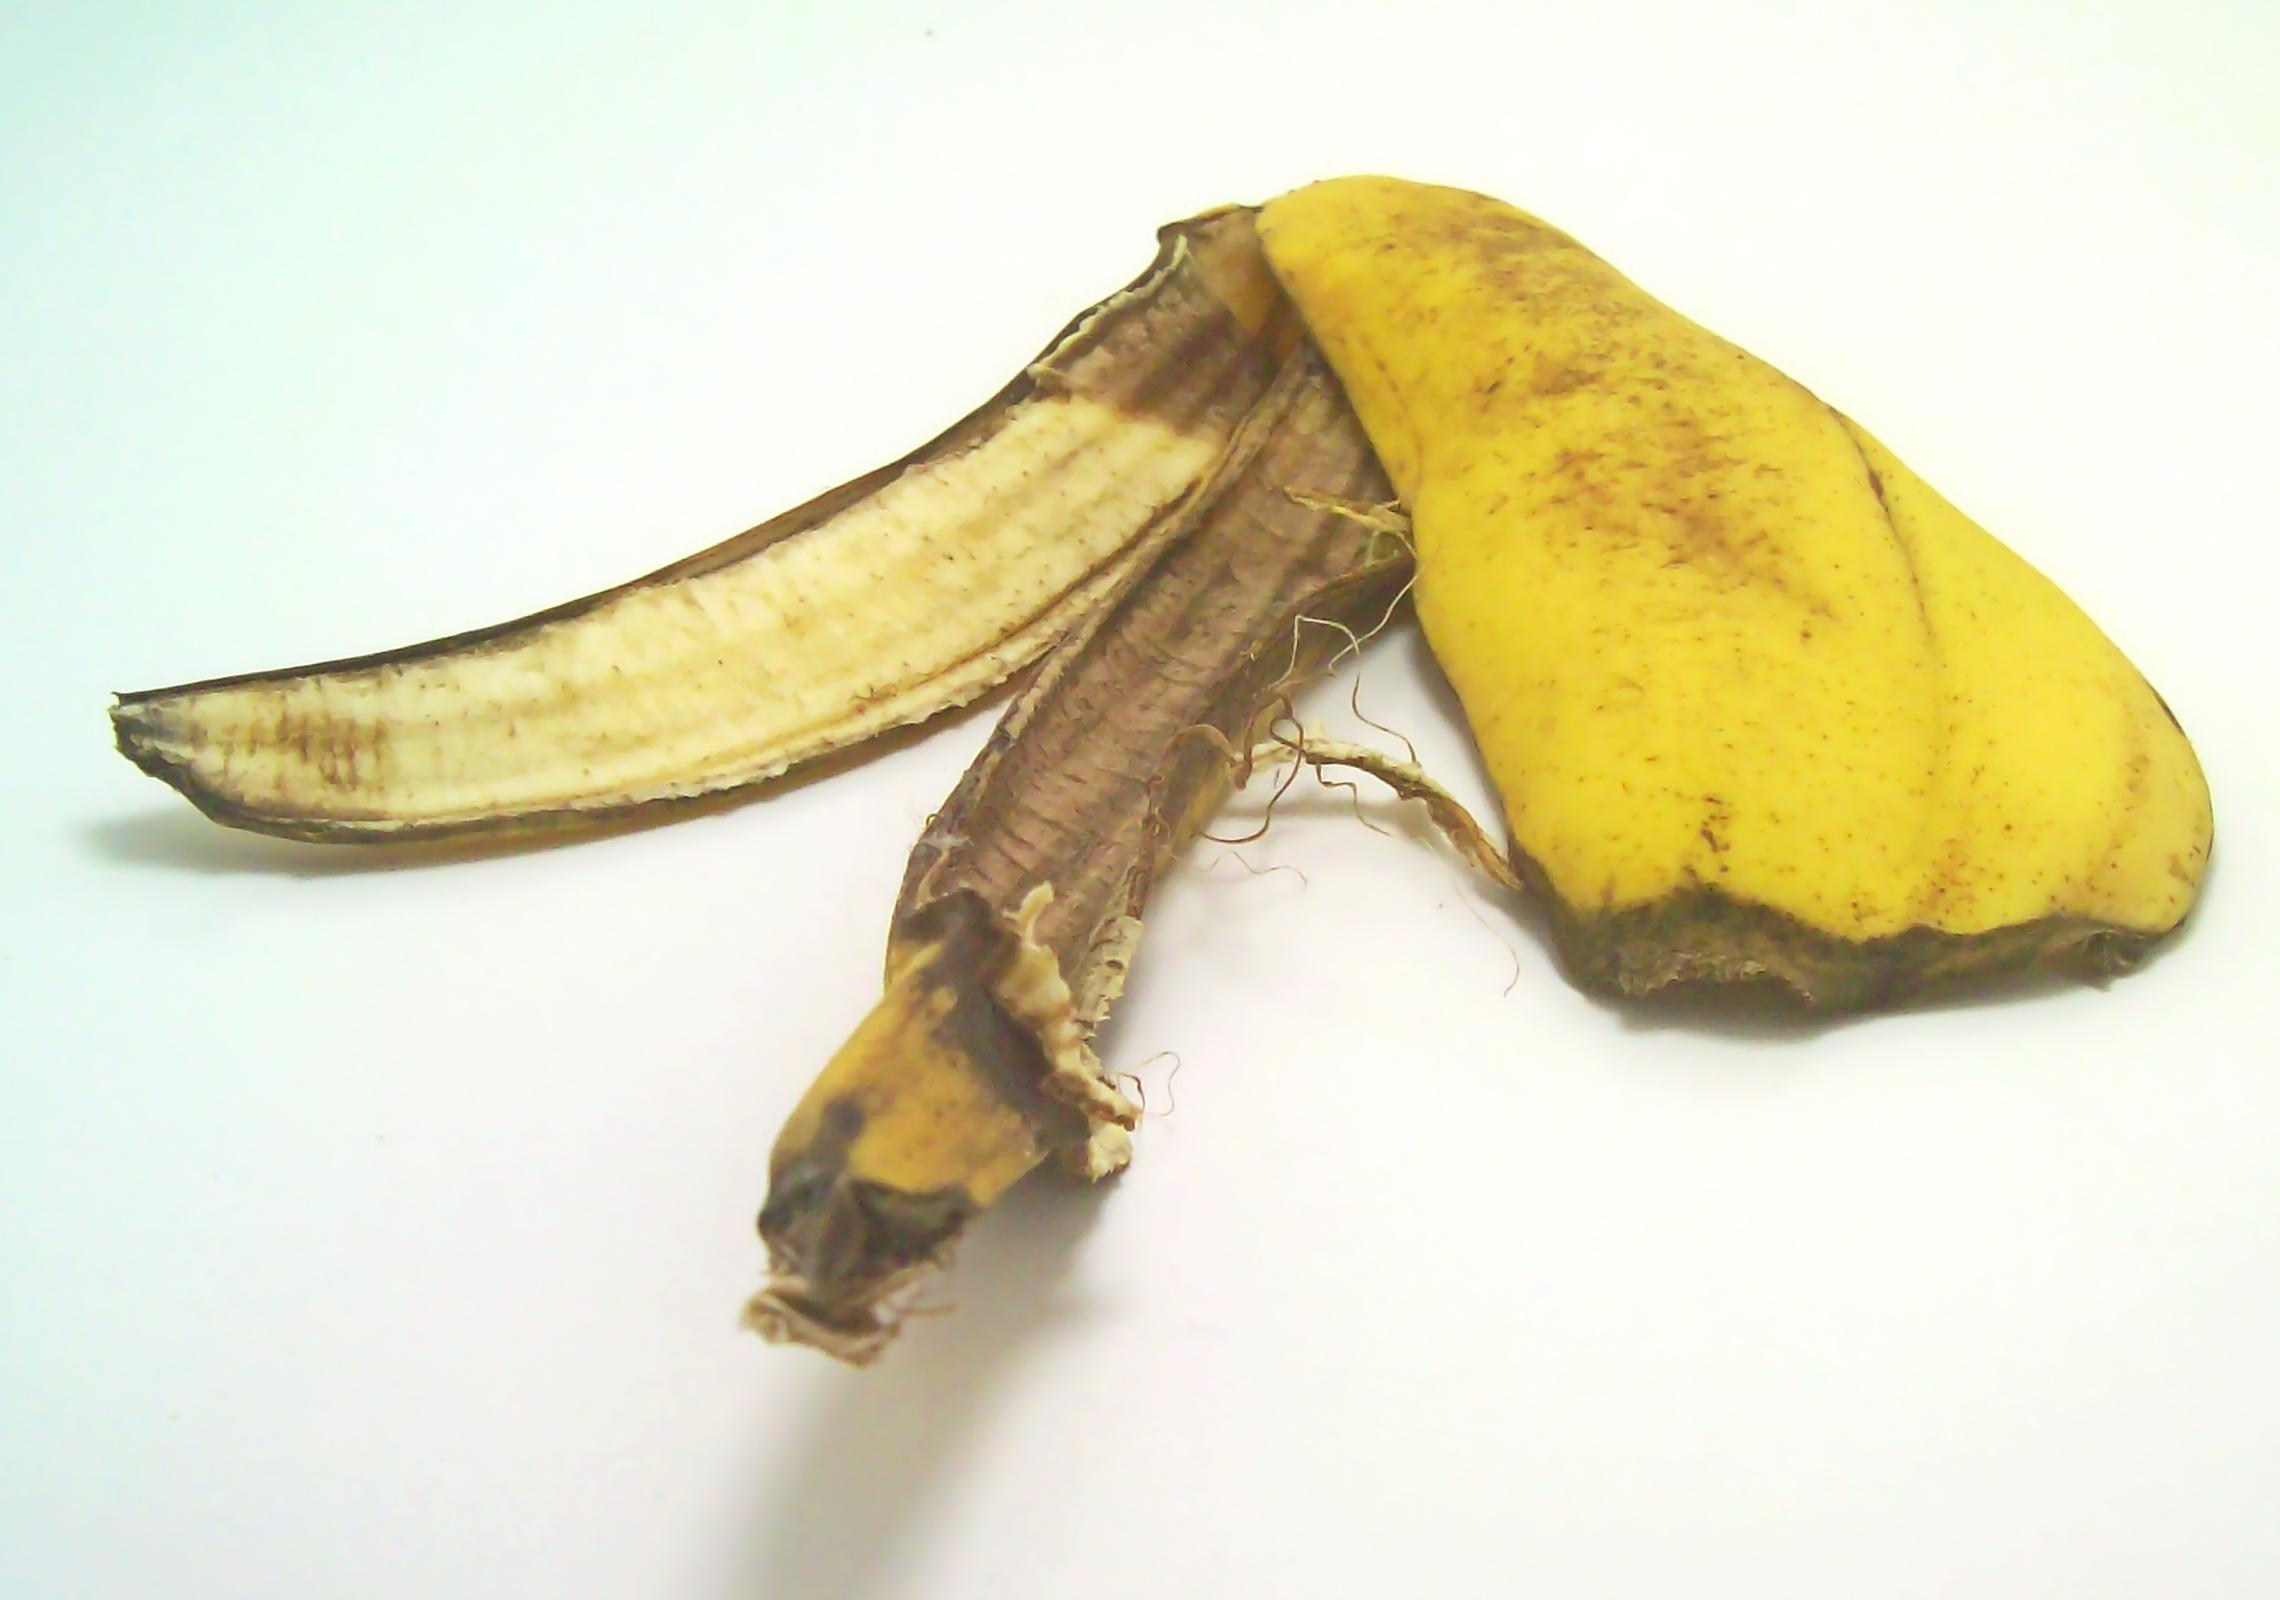 Banana peel, Old, Peel, Rotten, Yellow, HQ Photo